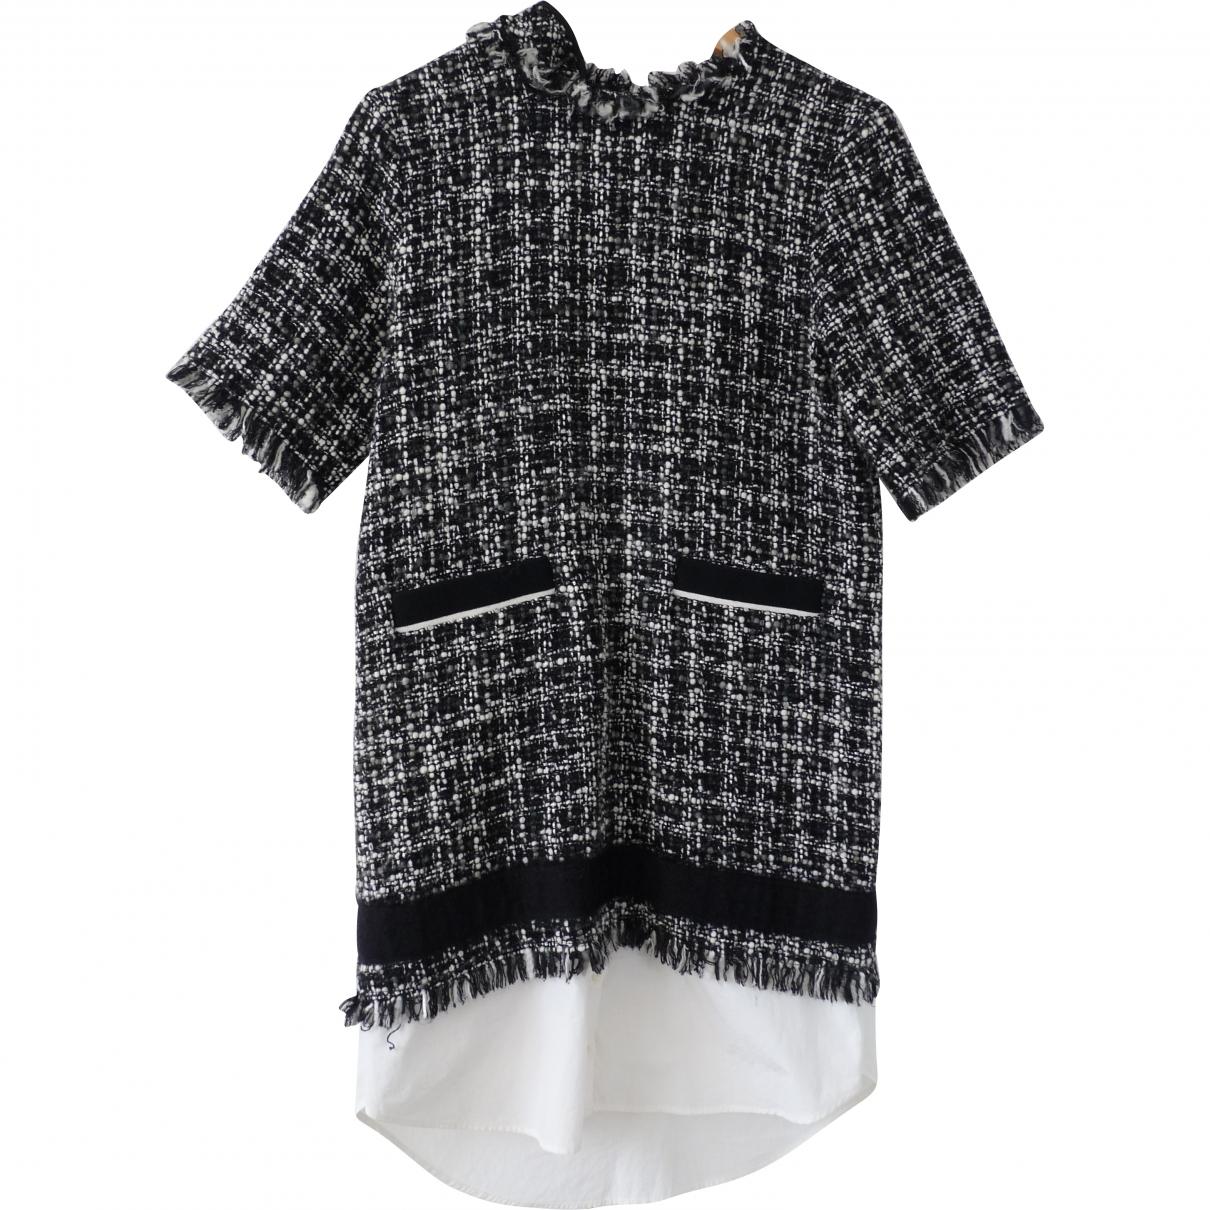 Msgm \N Black Tweed dress for Women 40 IT